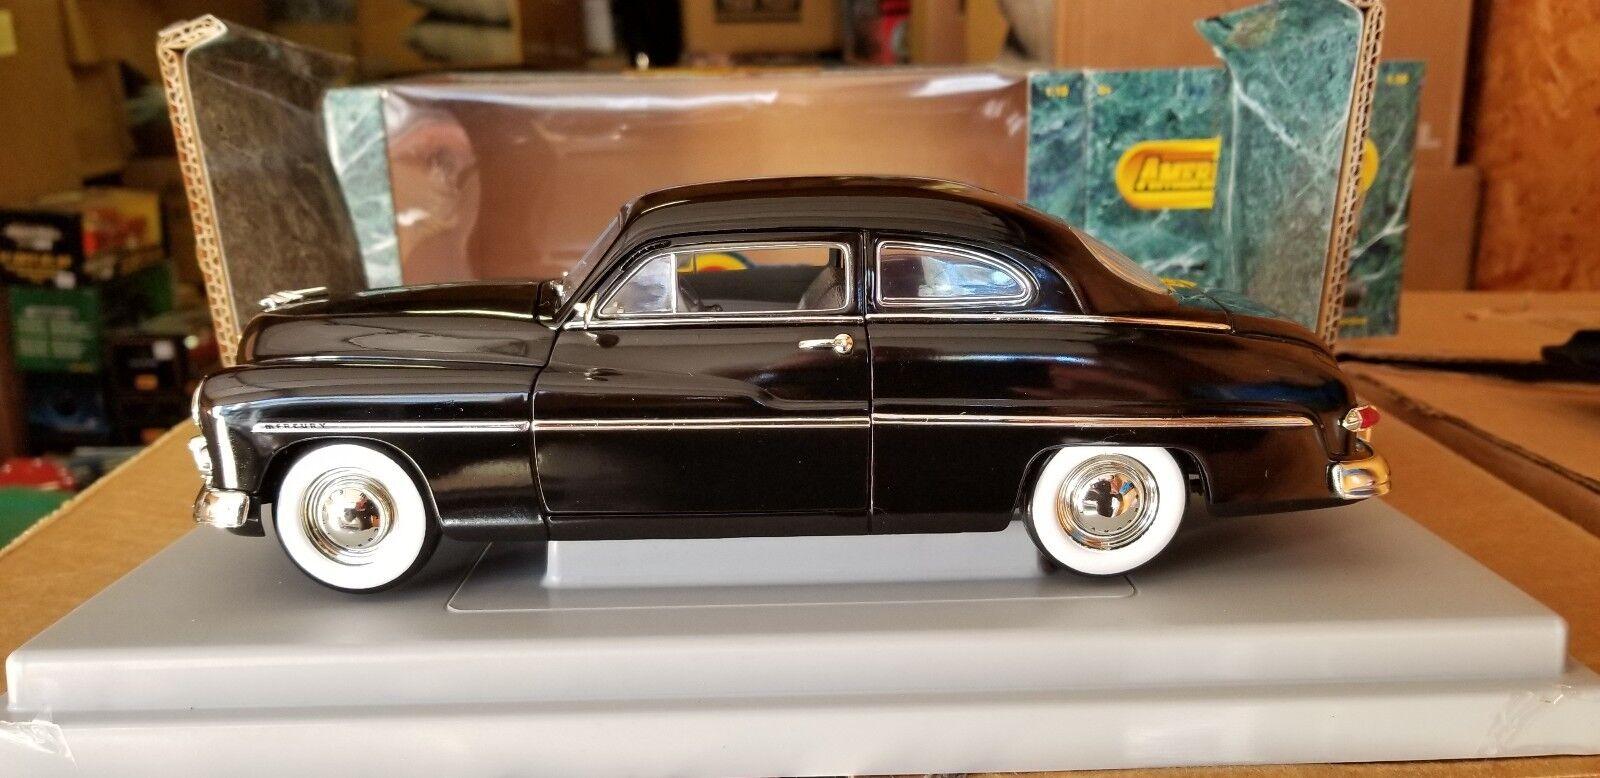 muchas sorpresas 1 1 1 18 Ertl American Muscle 1949 Mercury Coupe Negro  ventas en linea